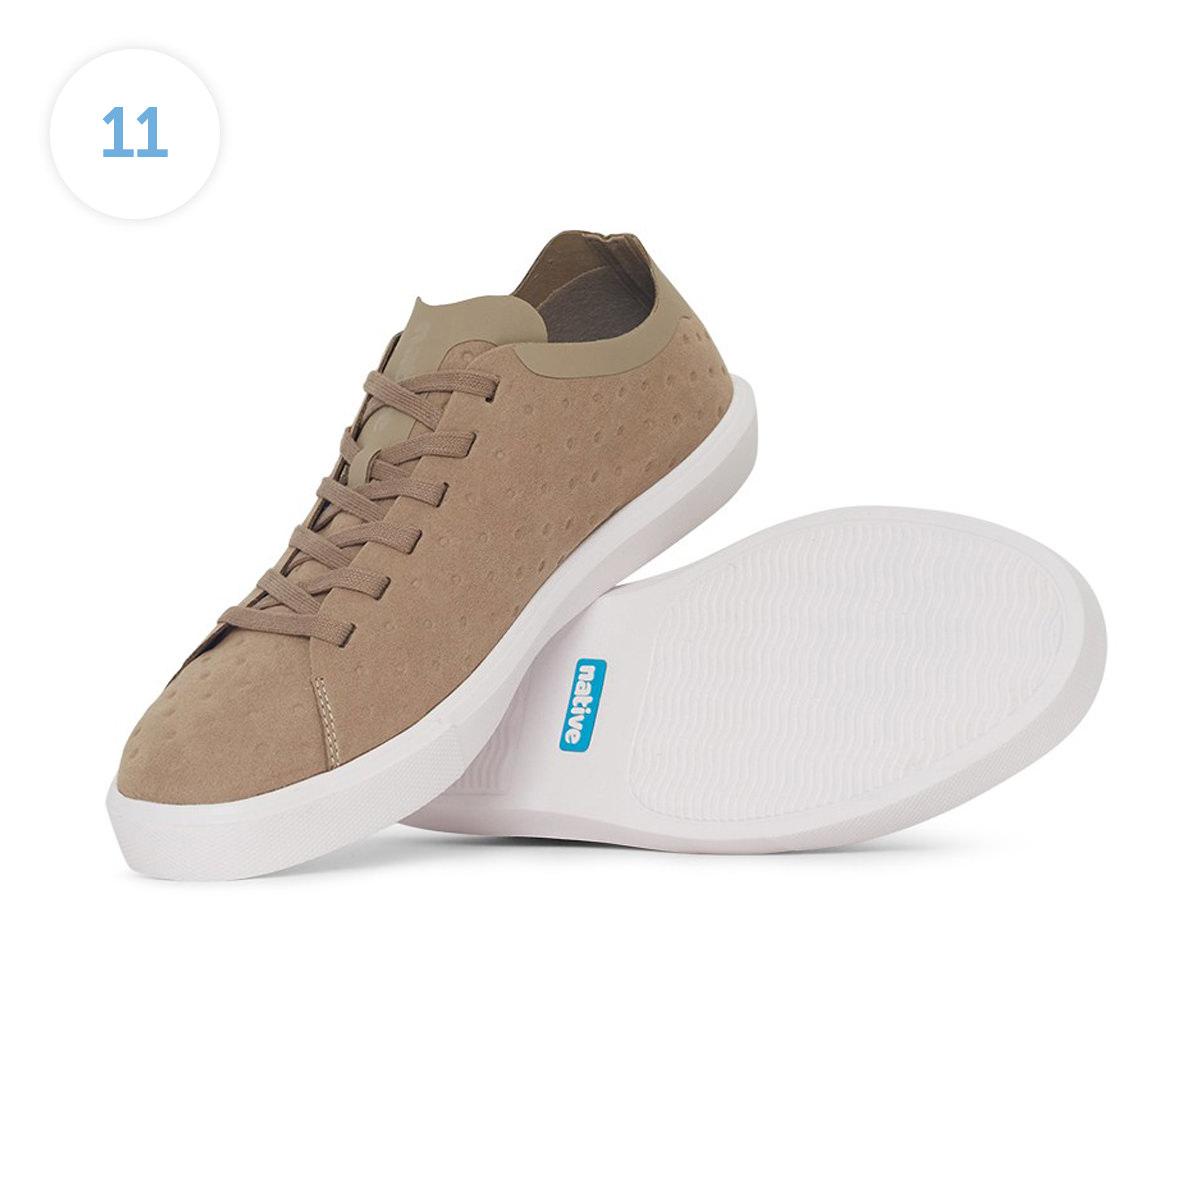 11-native-shoes.jpg